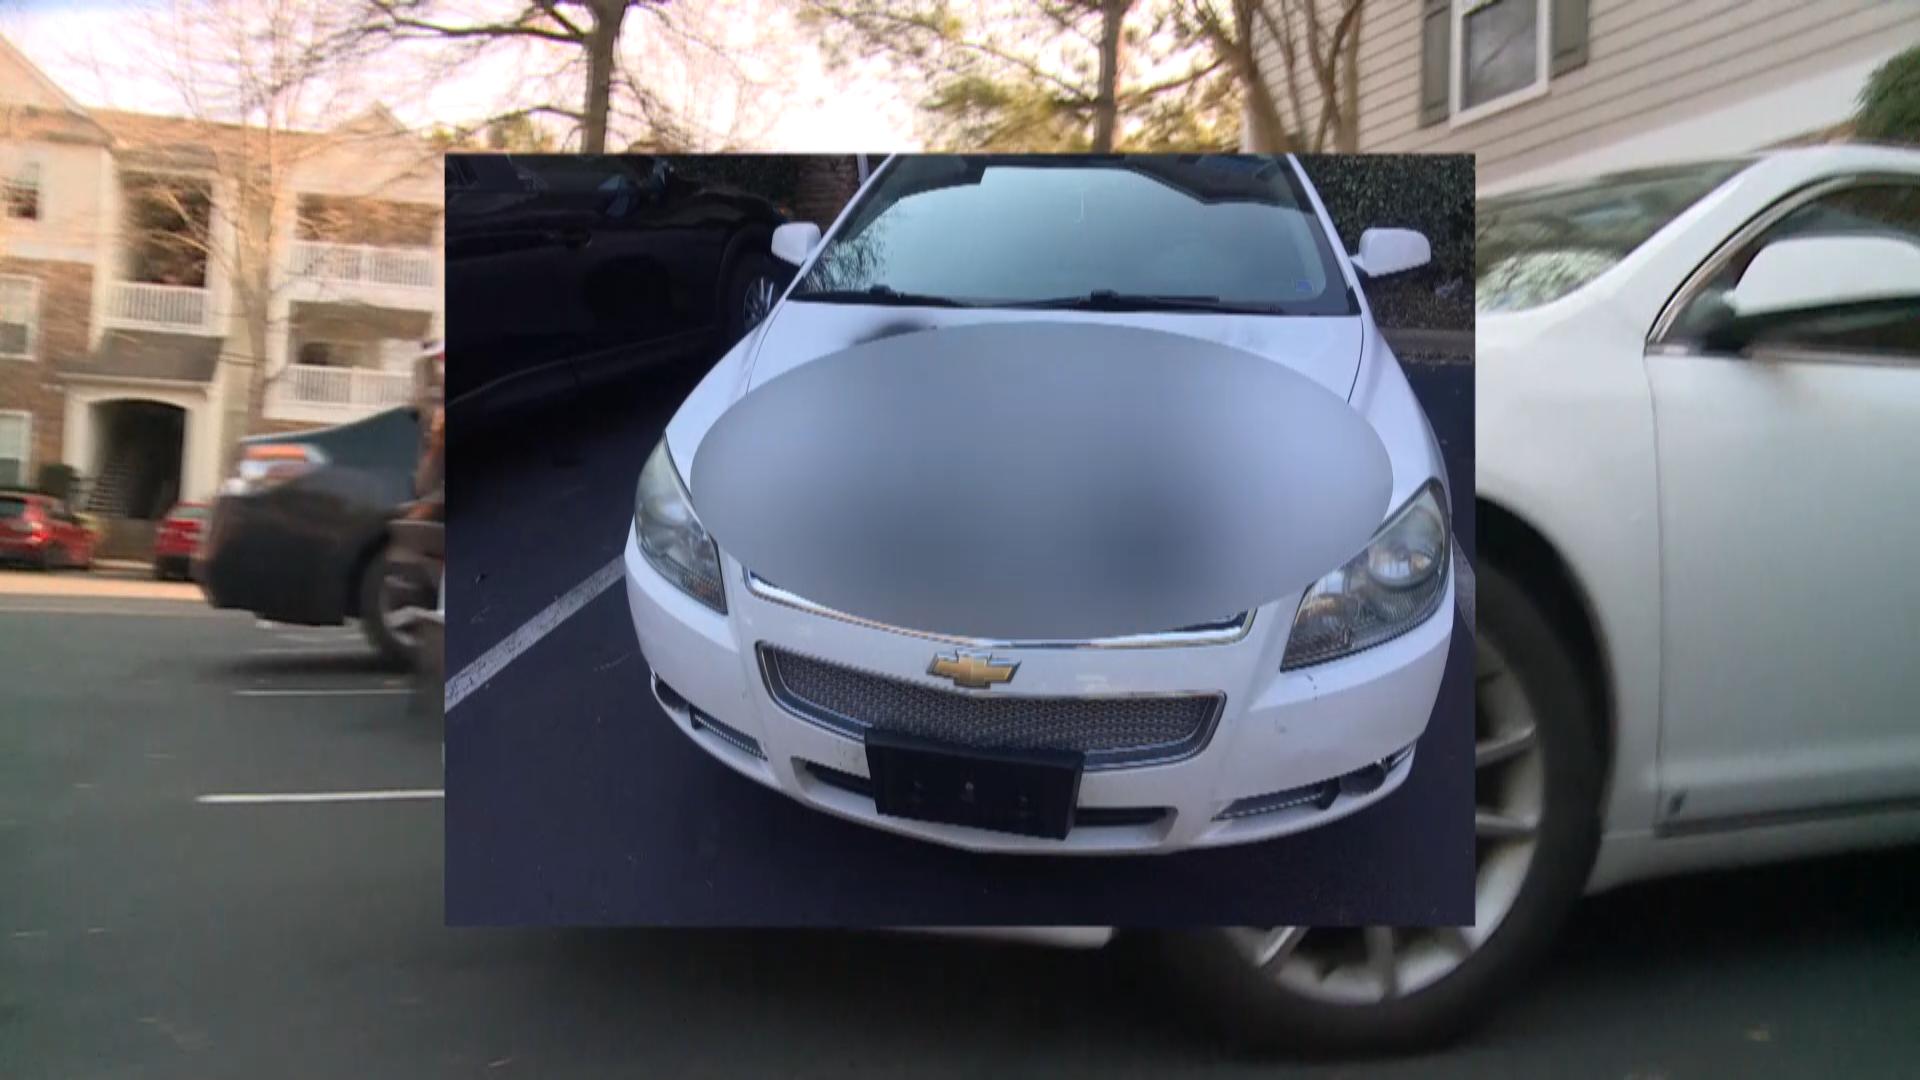 Vandals Spray Paint Cars With Racial Slurs Wcnc Com